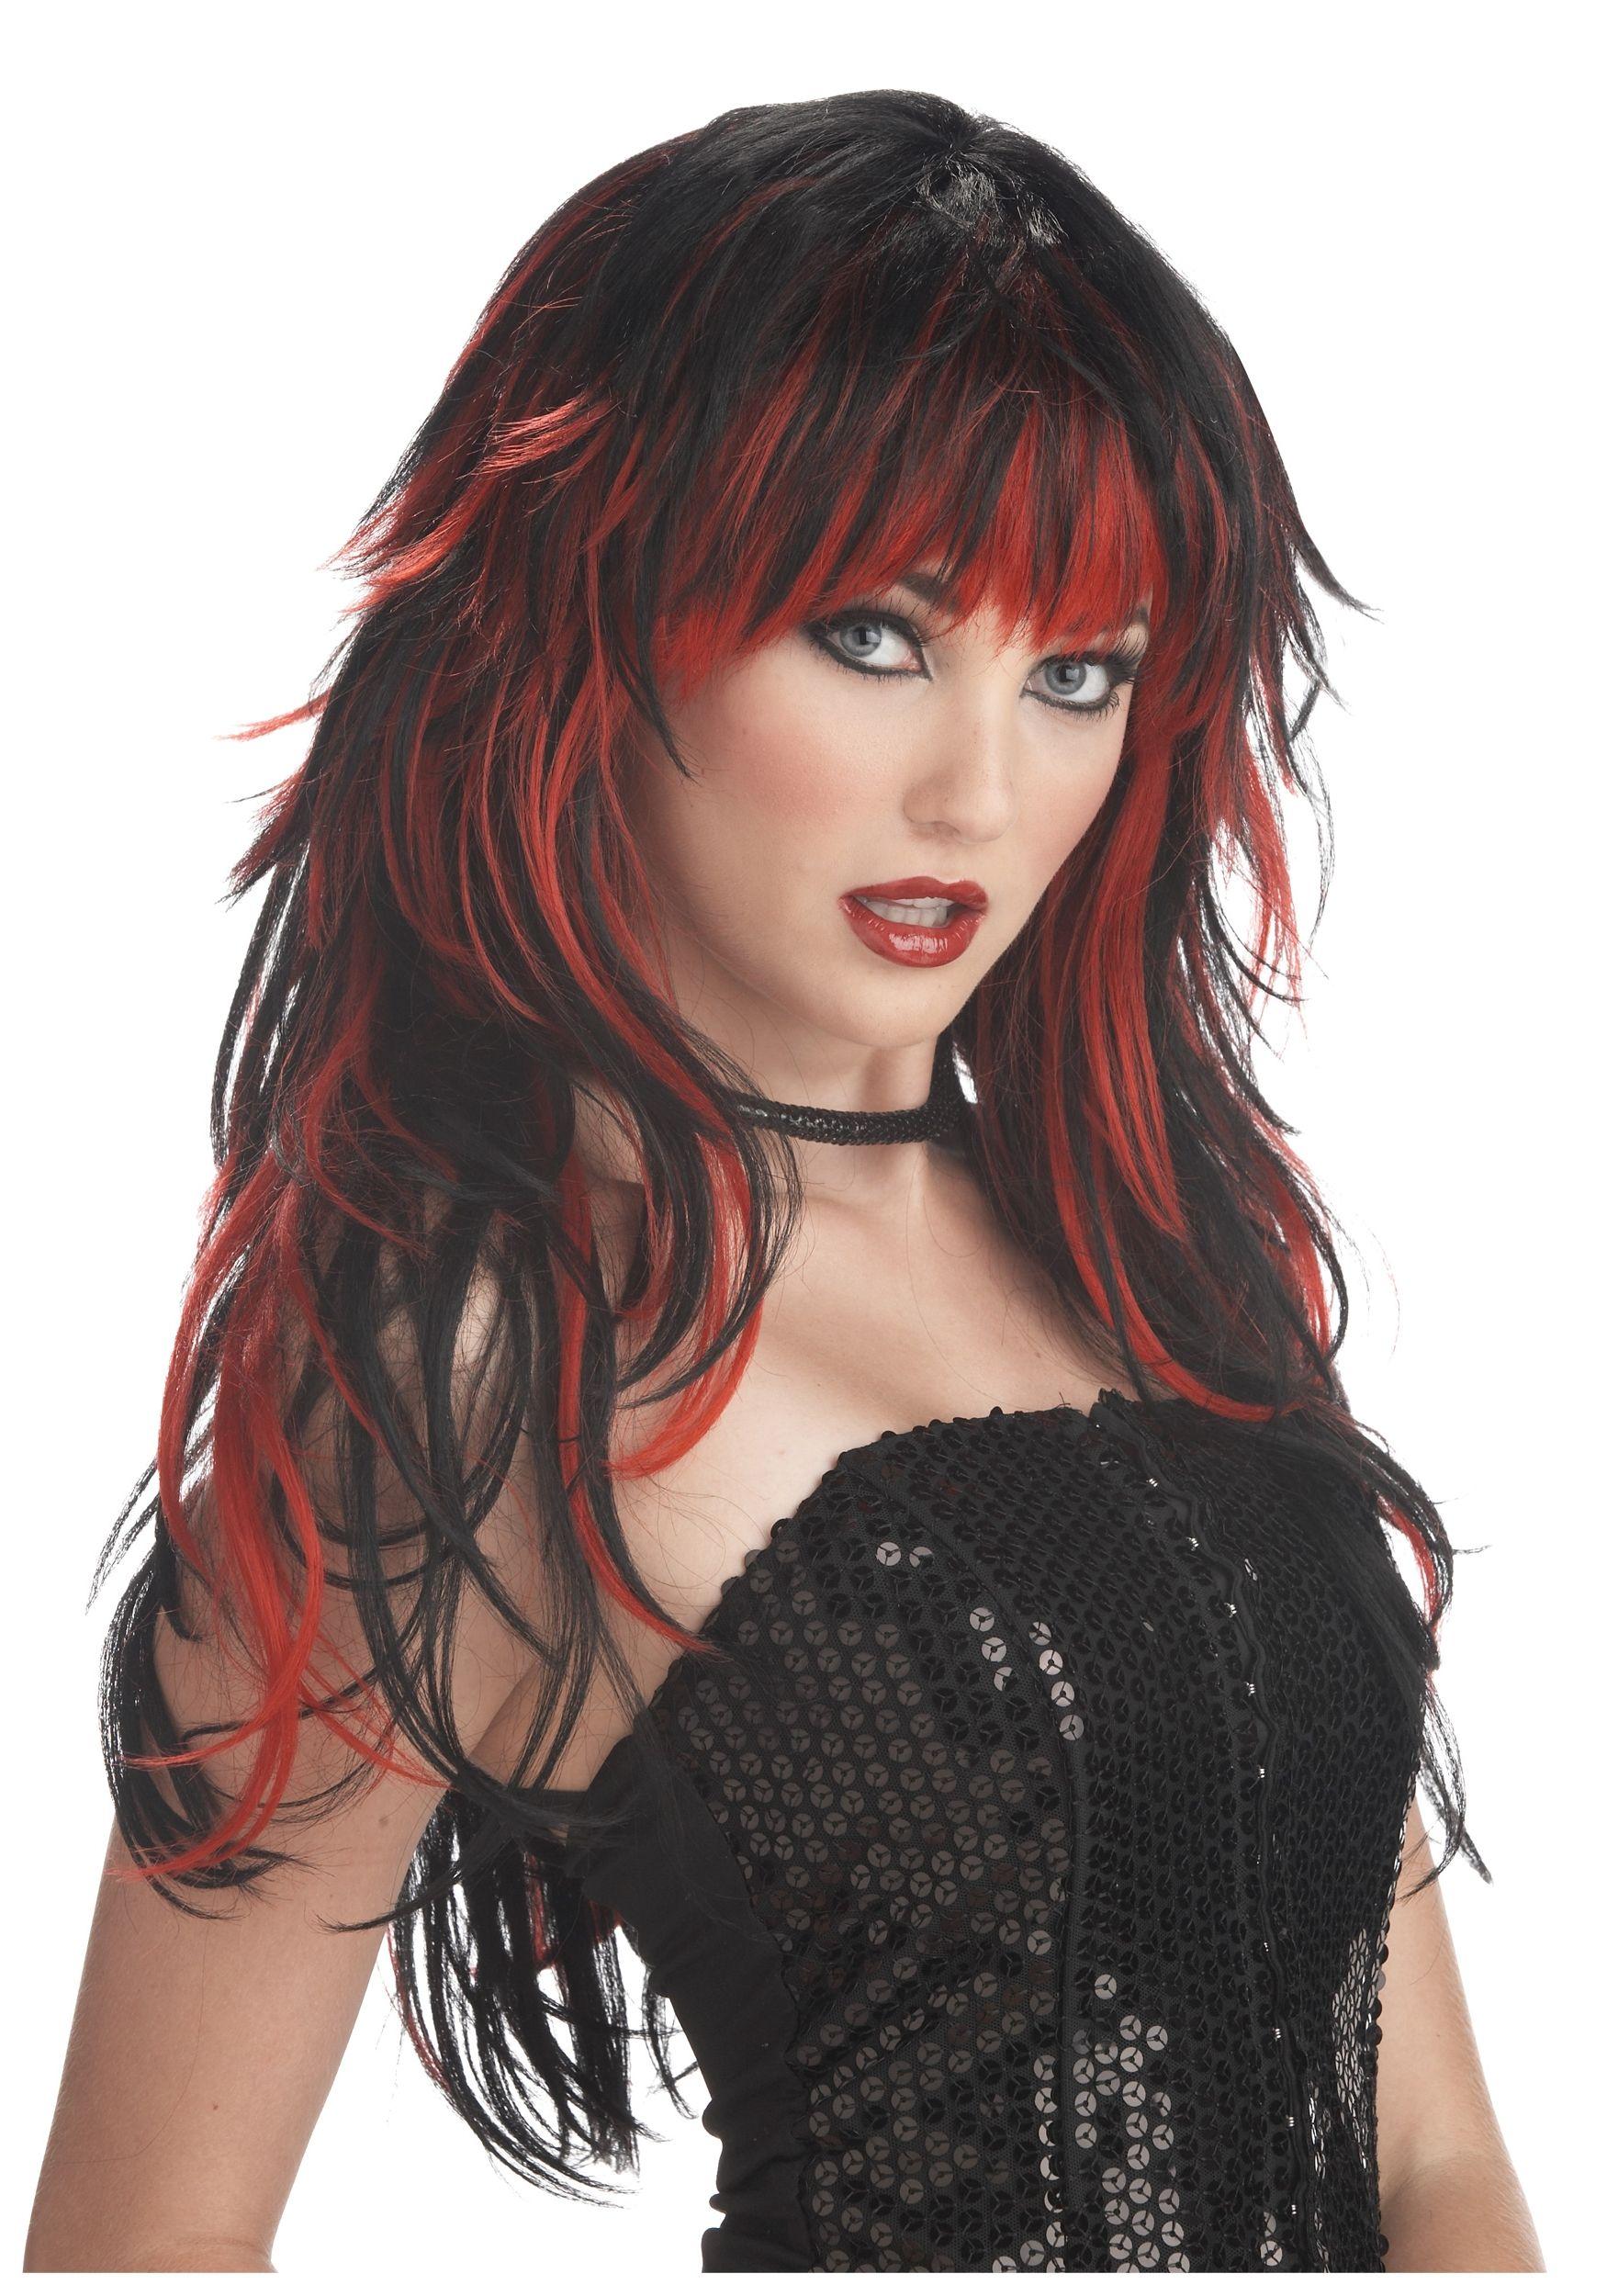 new goth newgothicgirlshaircuts201317 Daily